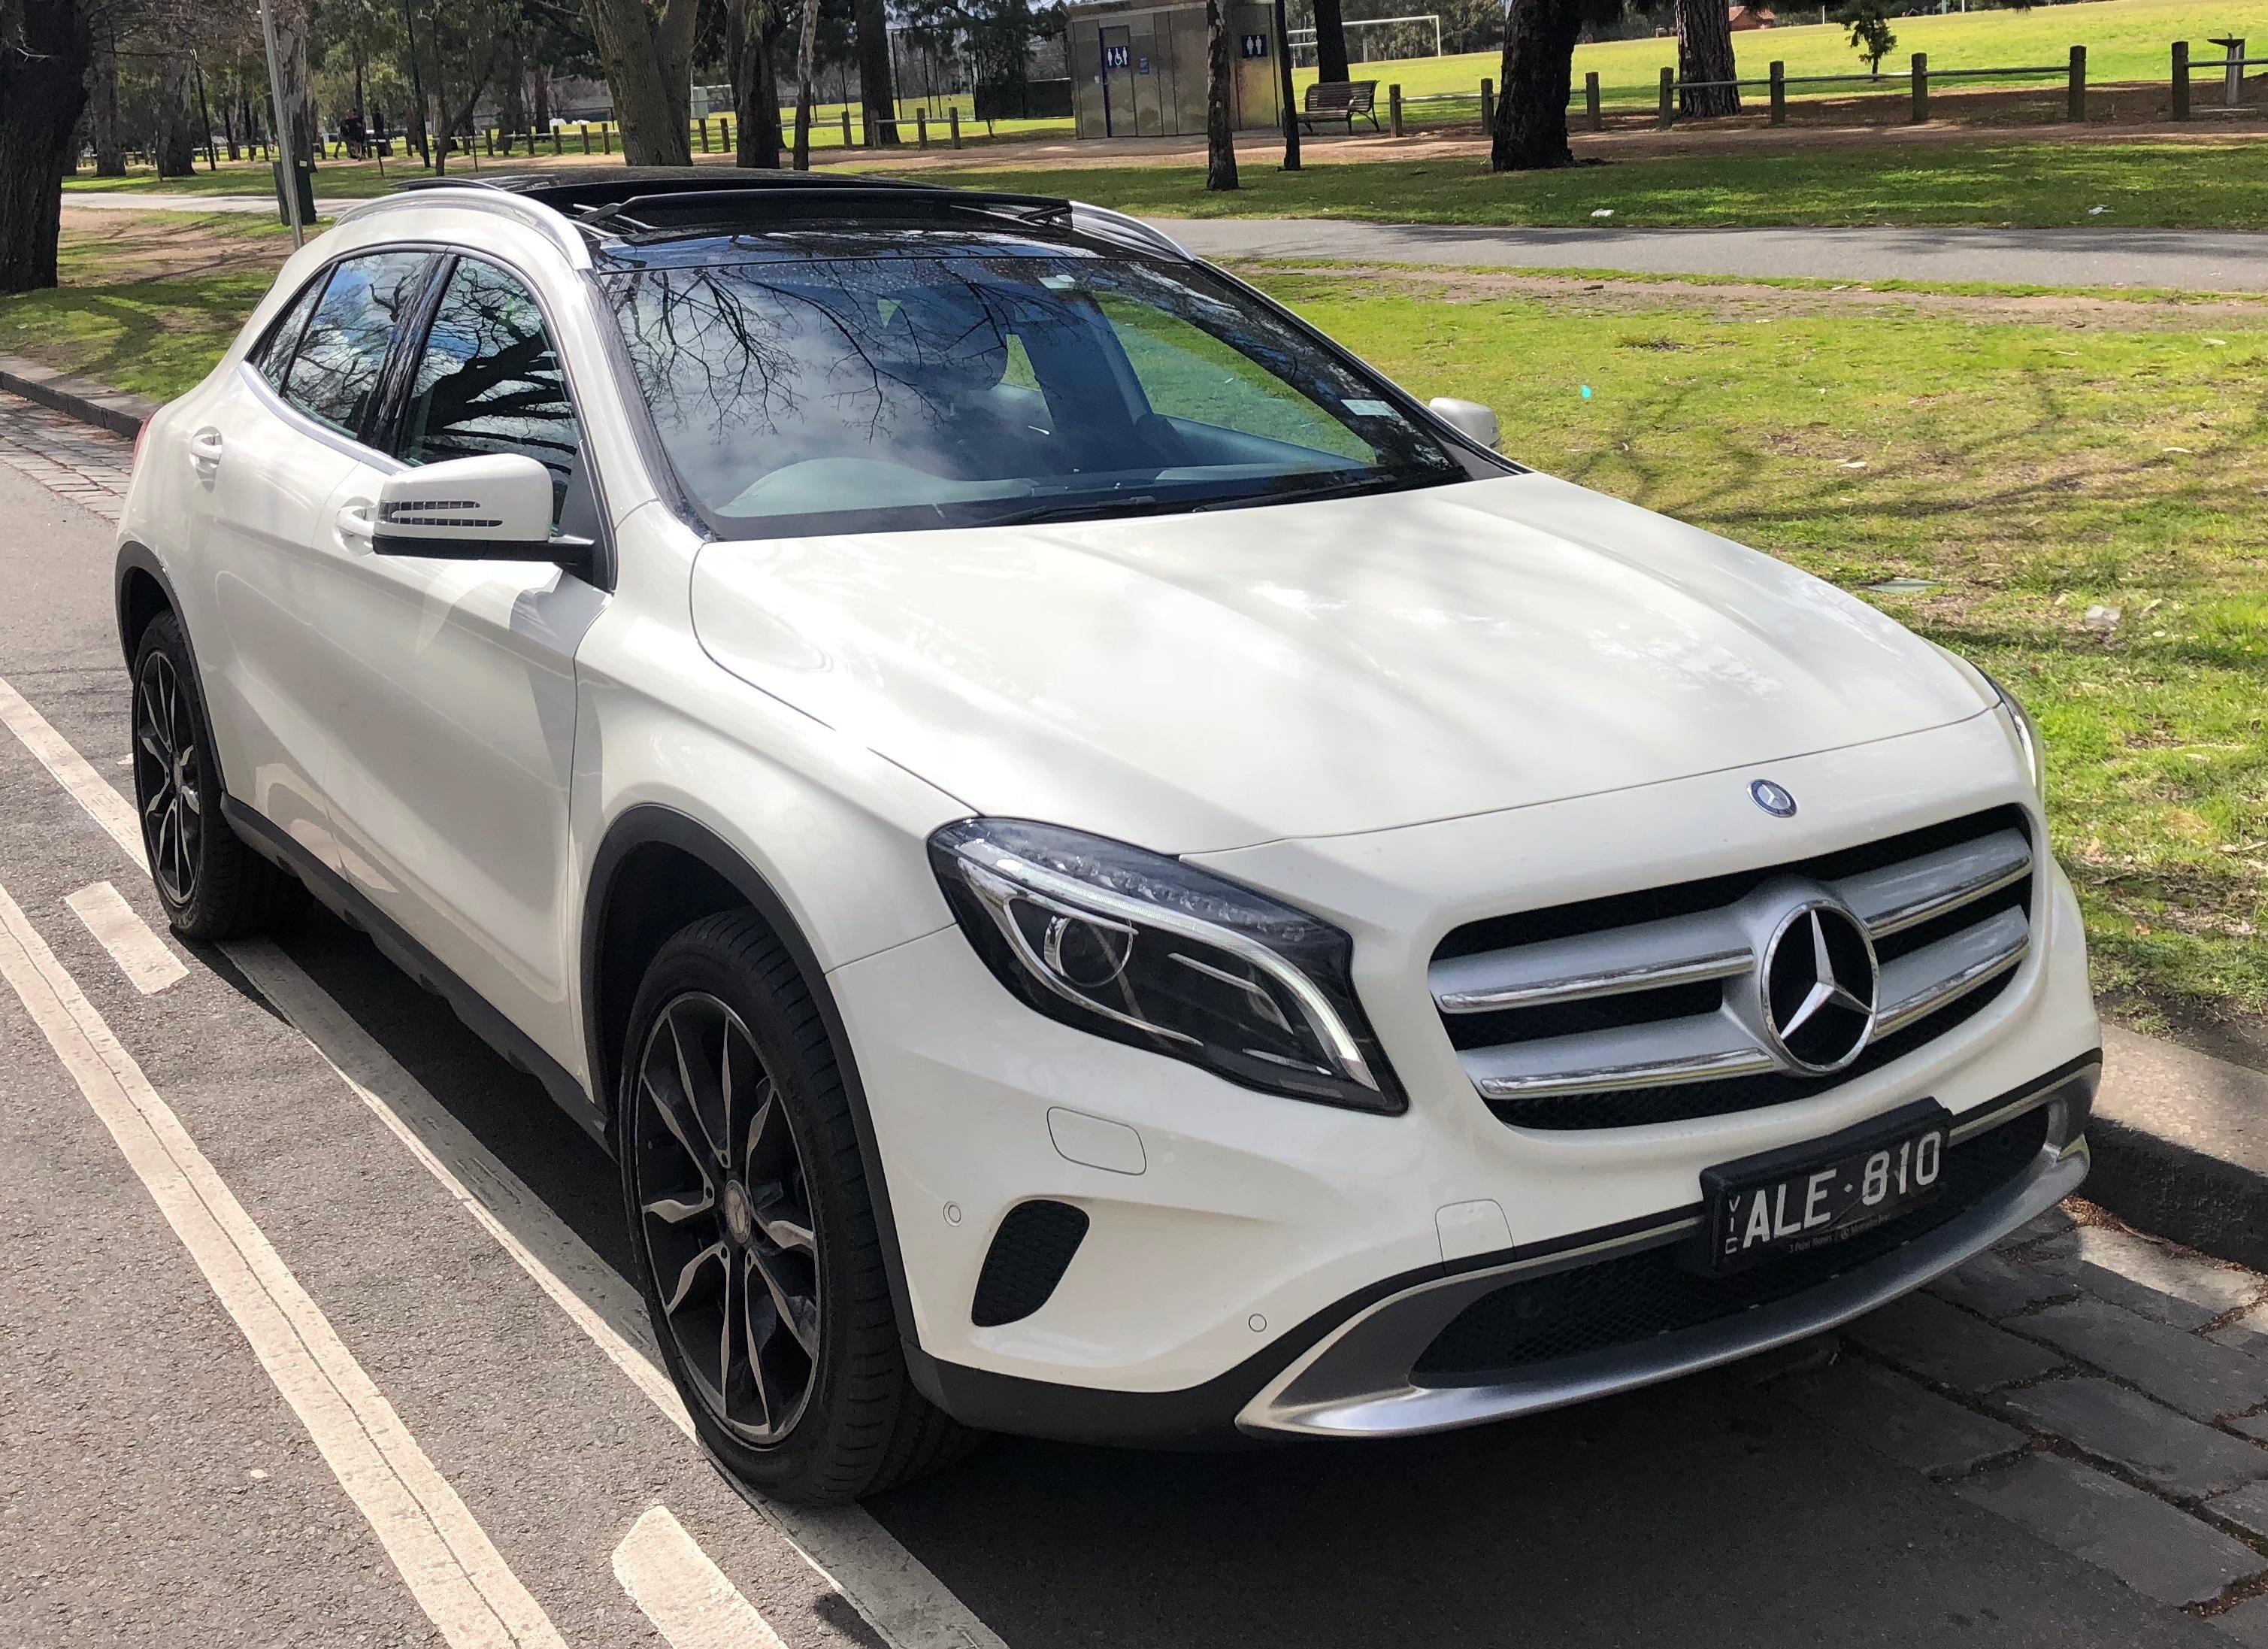 Picture of Shuaiqi's 2016 Mercedes-Benz GLA220d